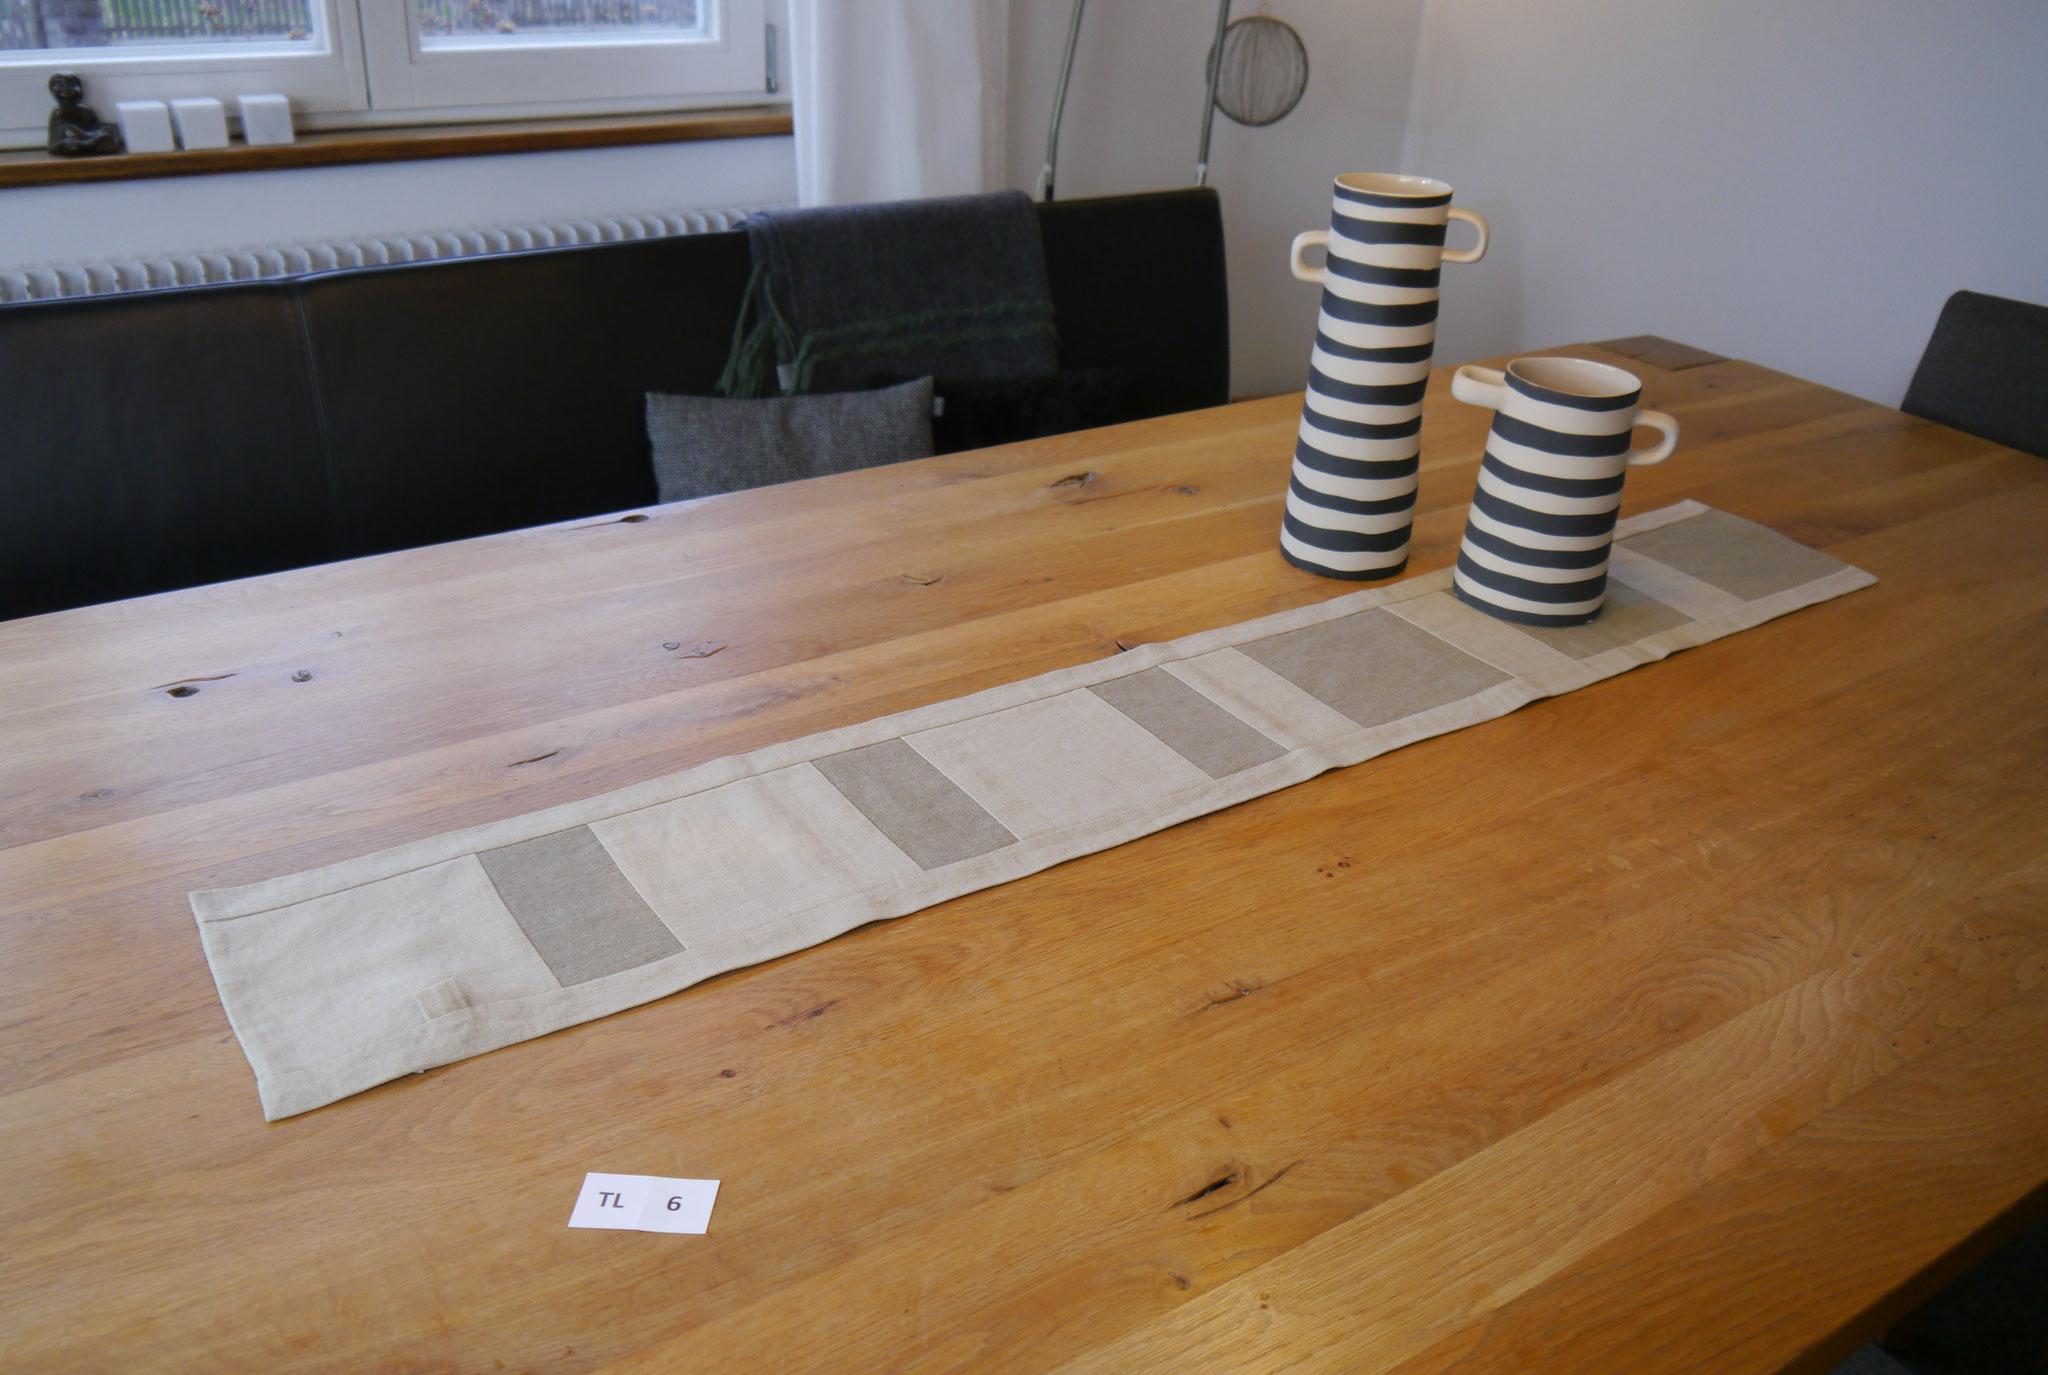 TL 6: 120 x 19 cm * Leinen * 44,90 €